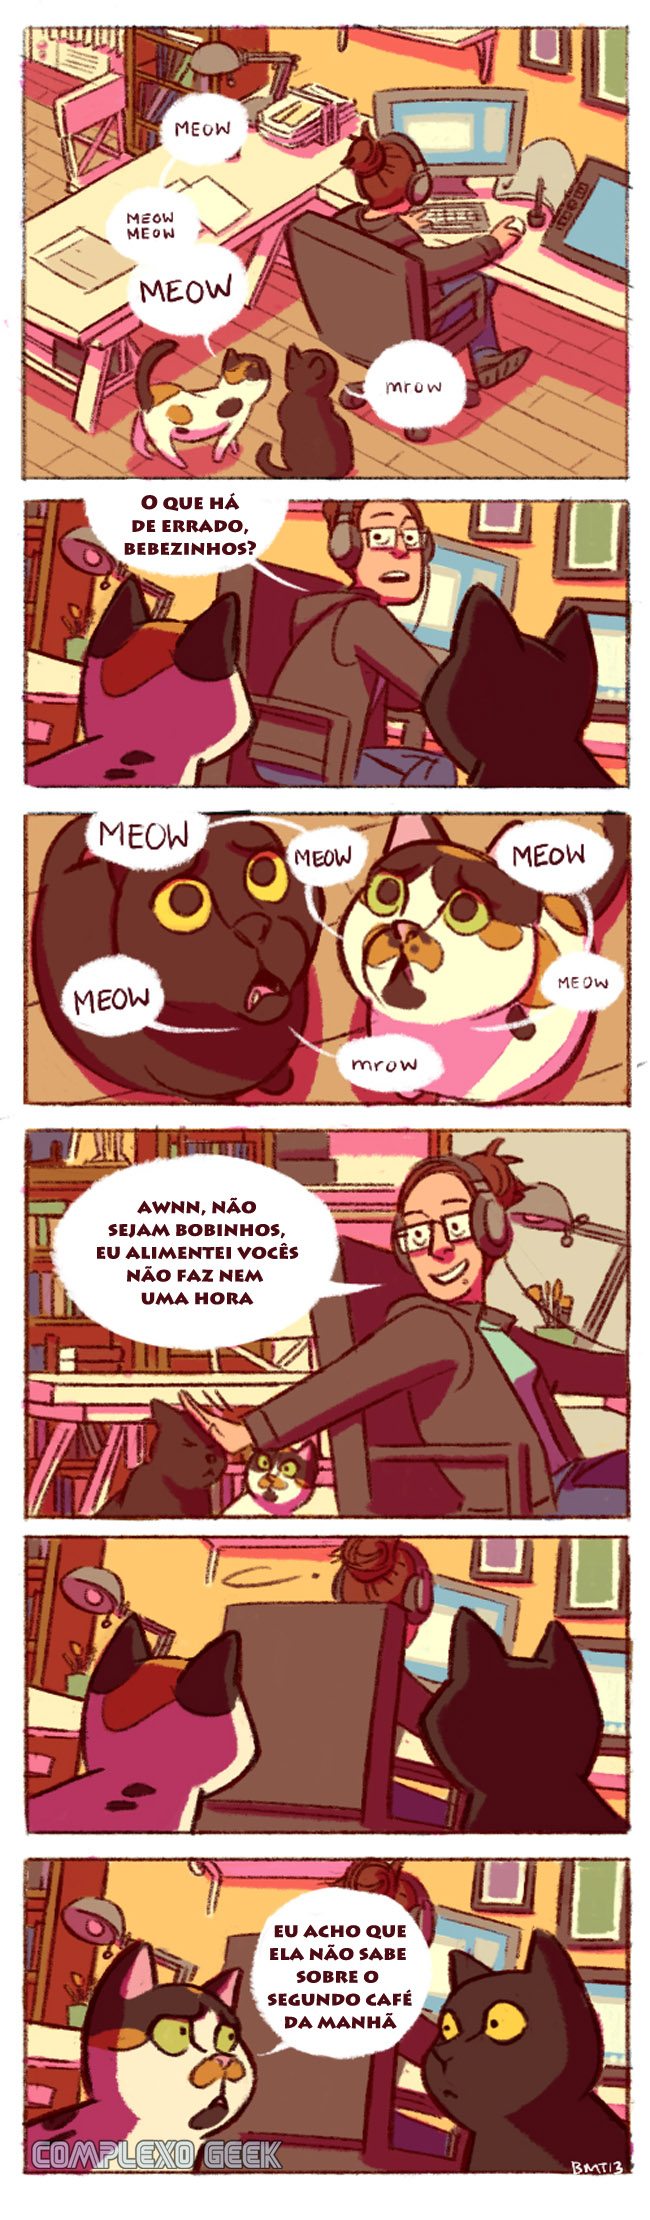 0 gatos sao hobbits